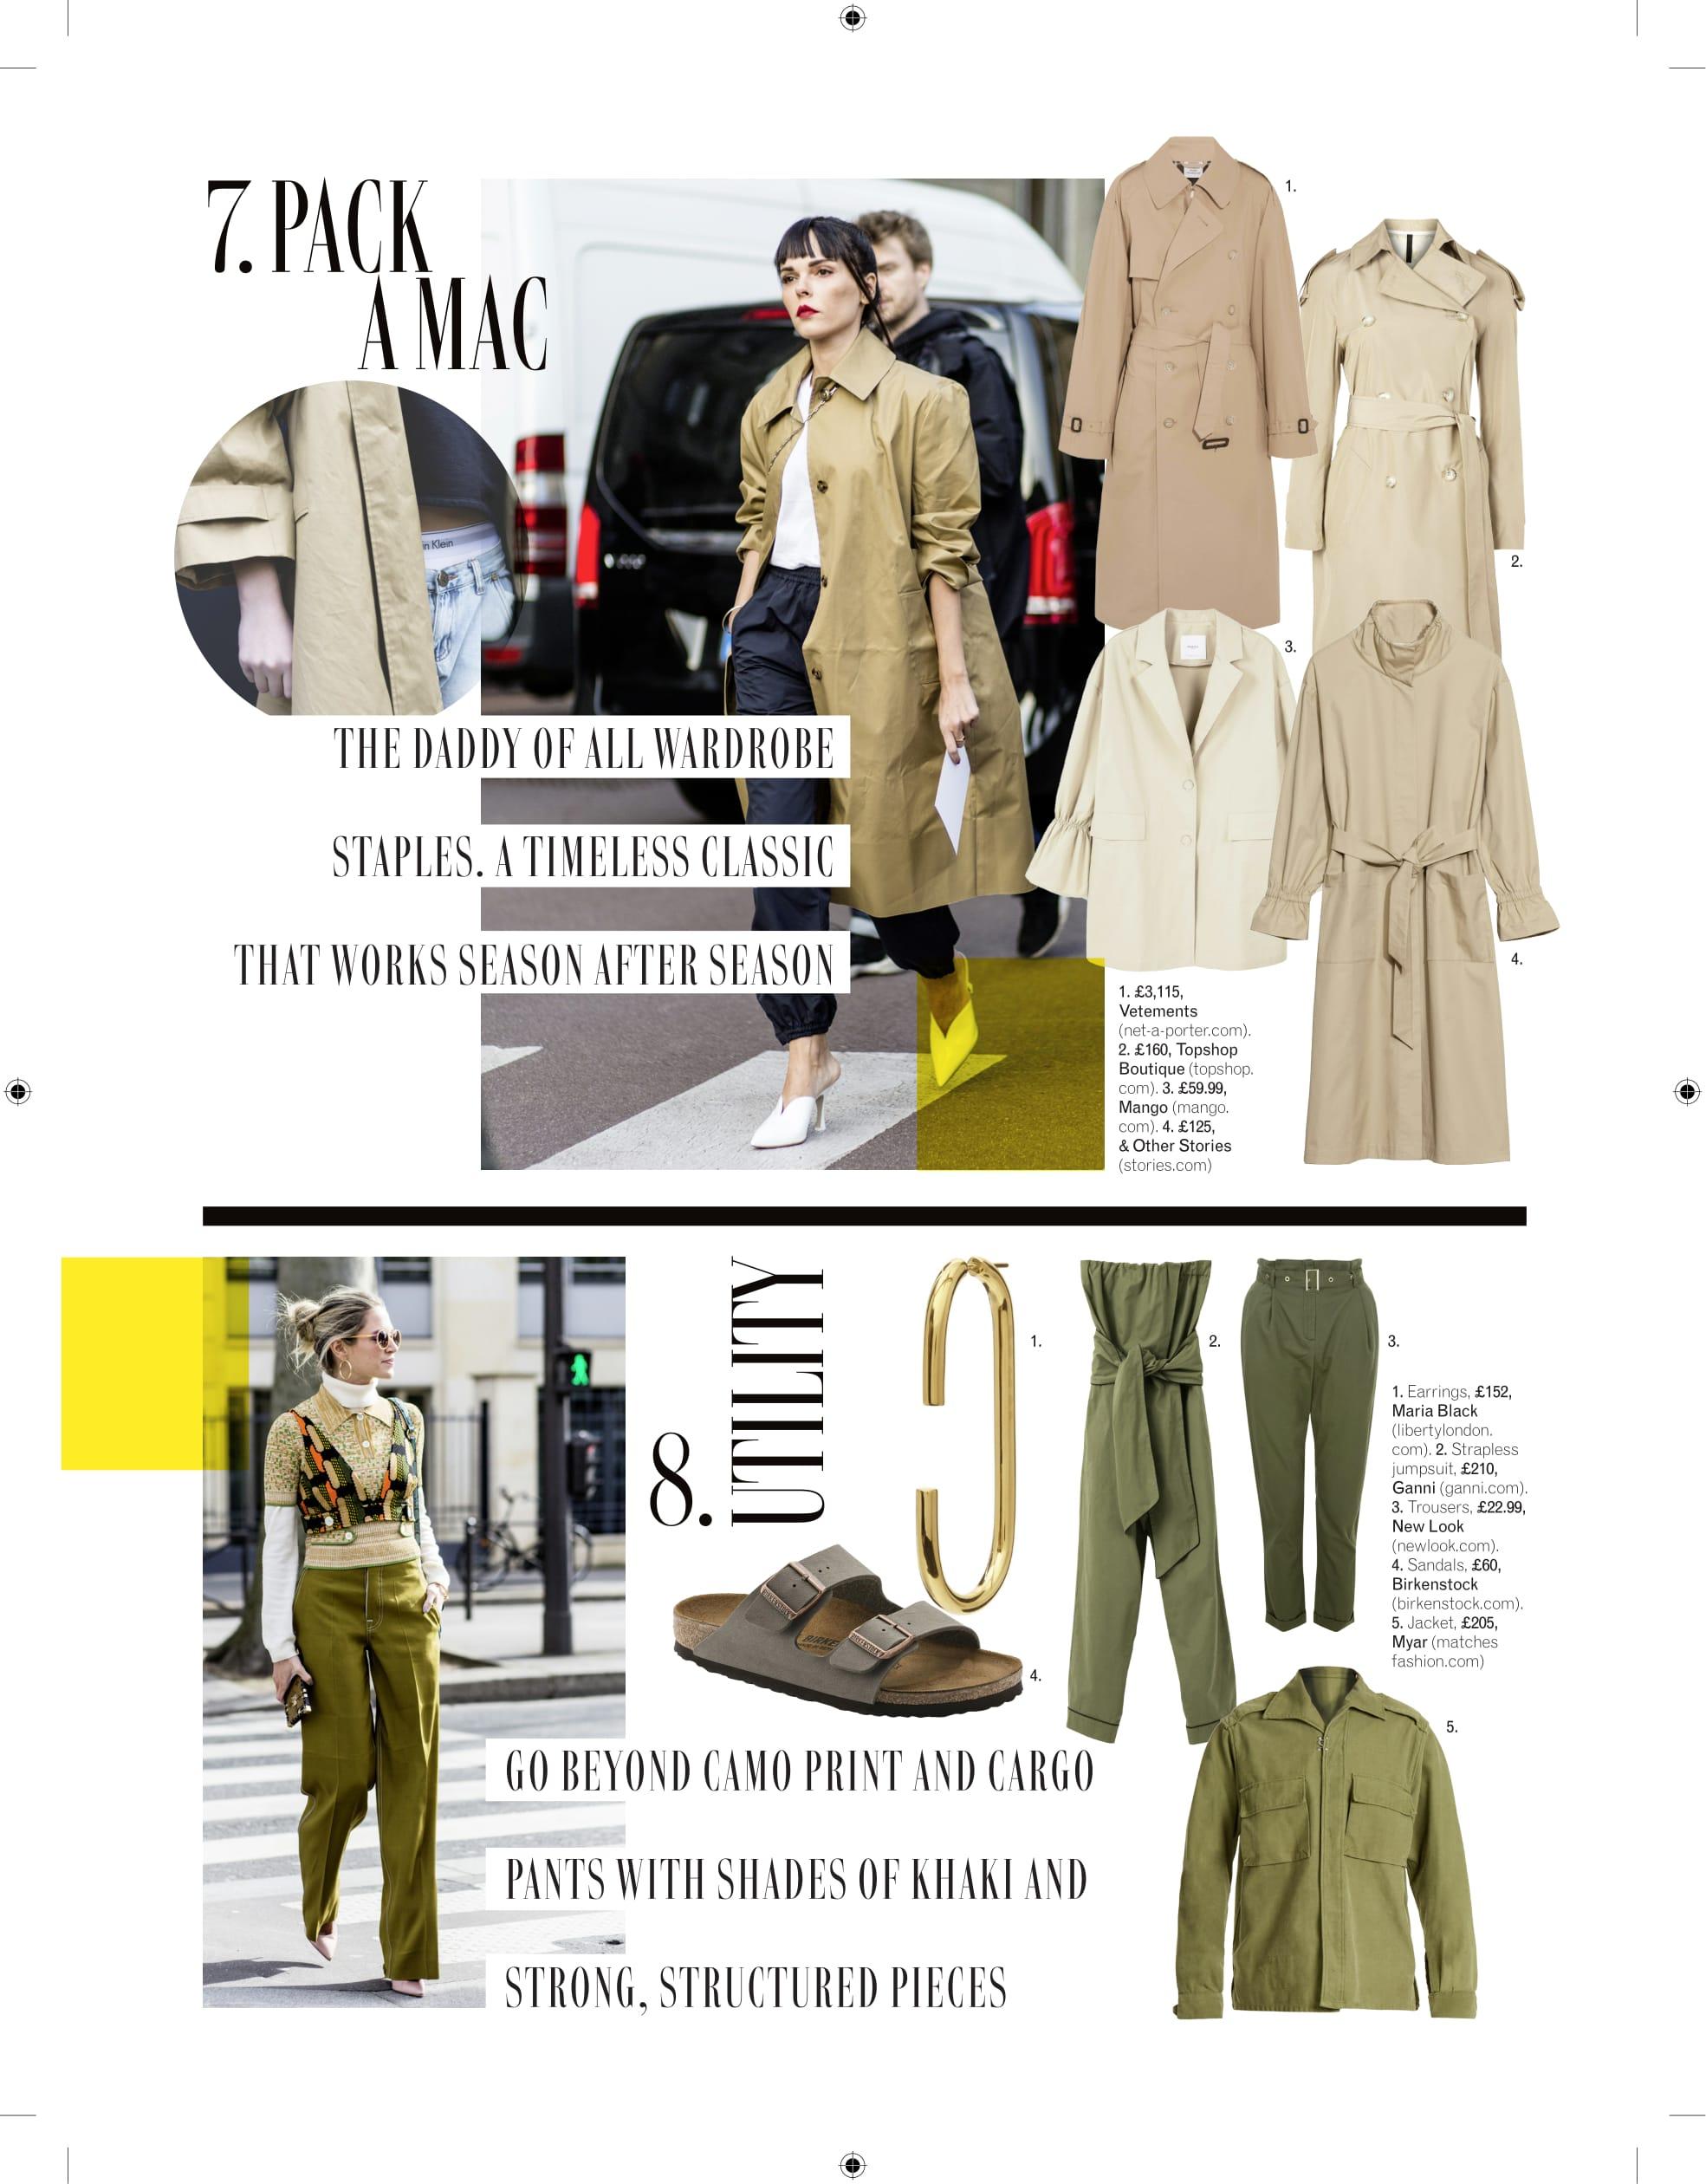 Fashion_STREET STYLE SPESH 6pp_pdf_5-1.jpg